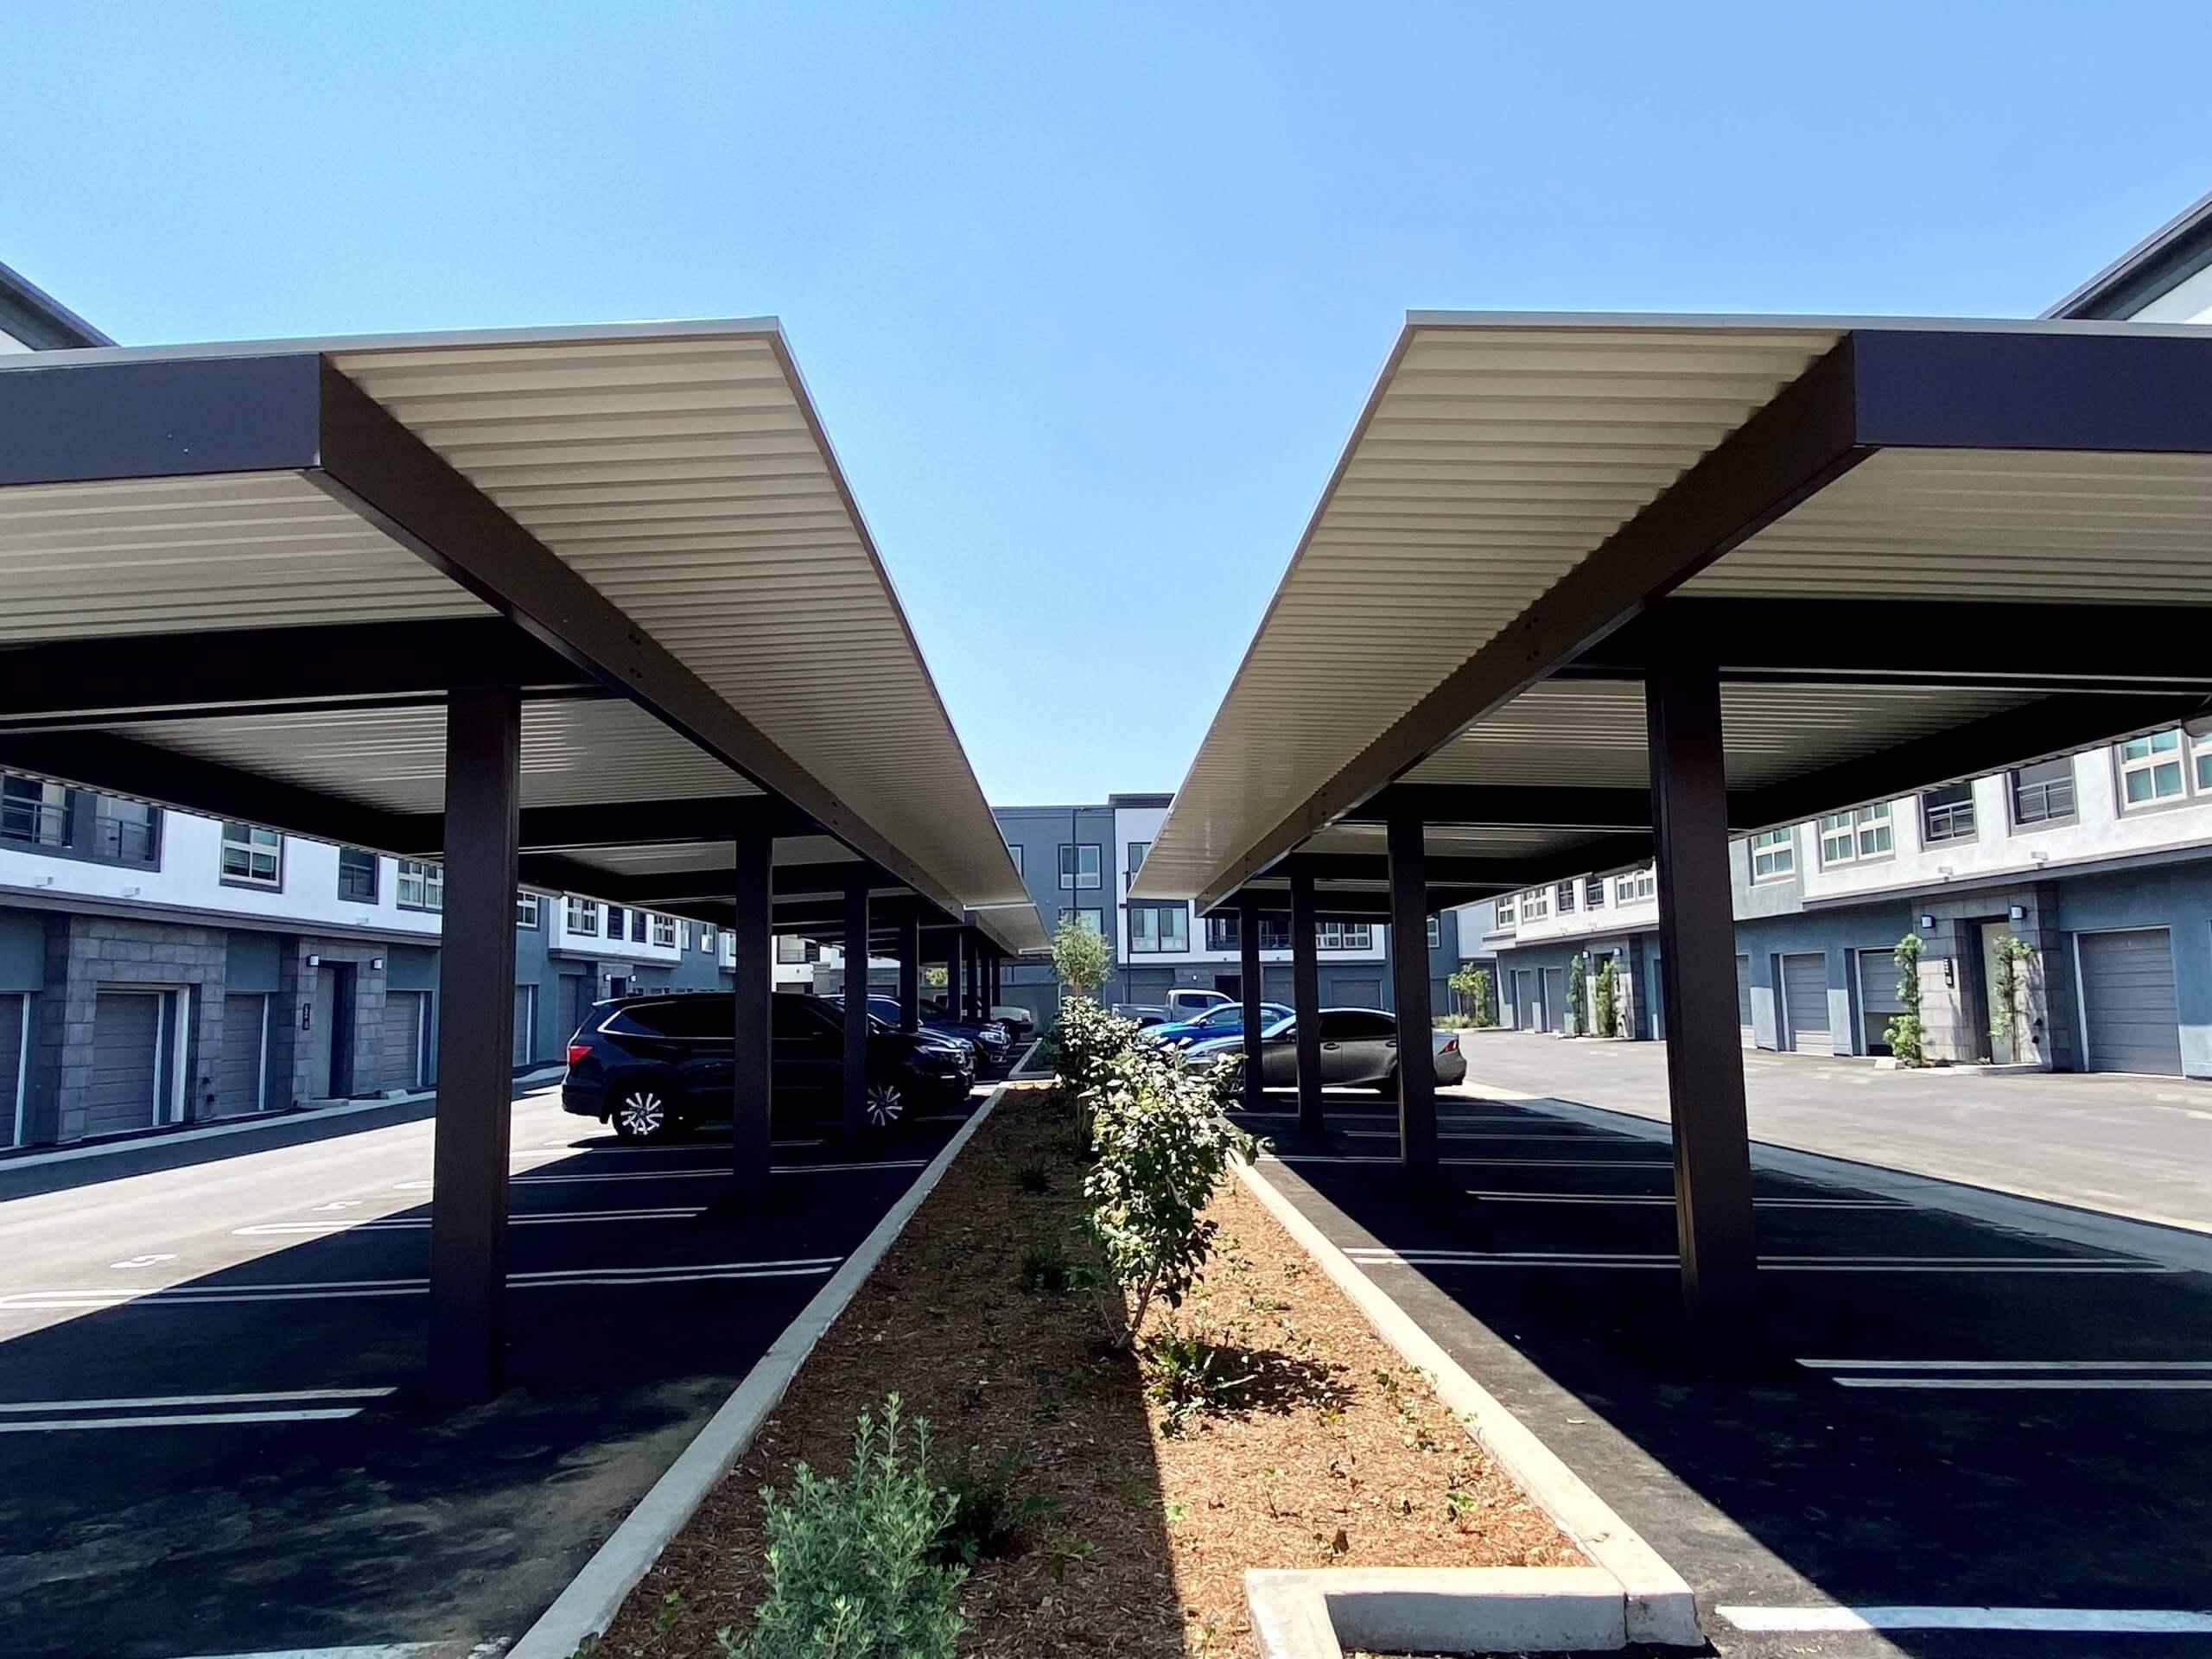 Persea Apartments